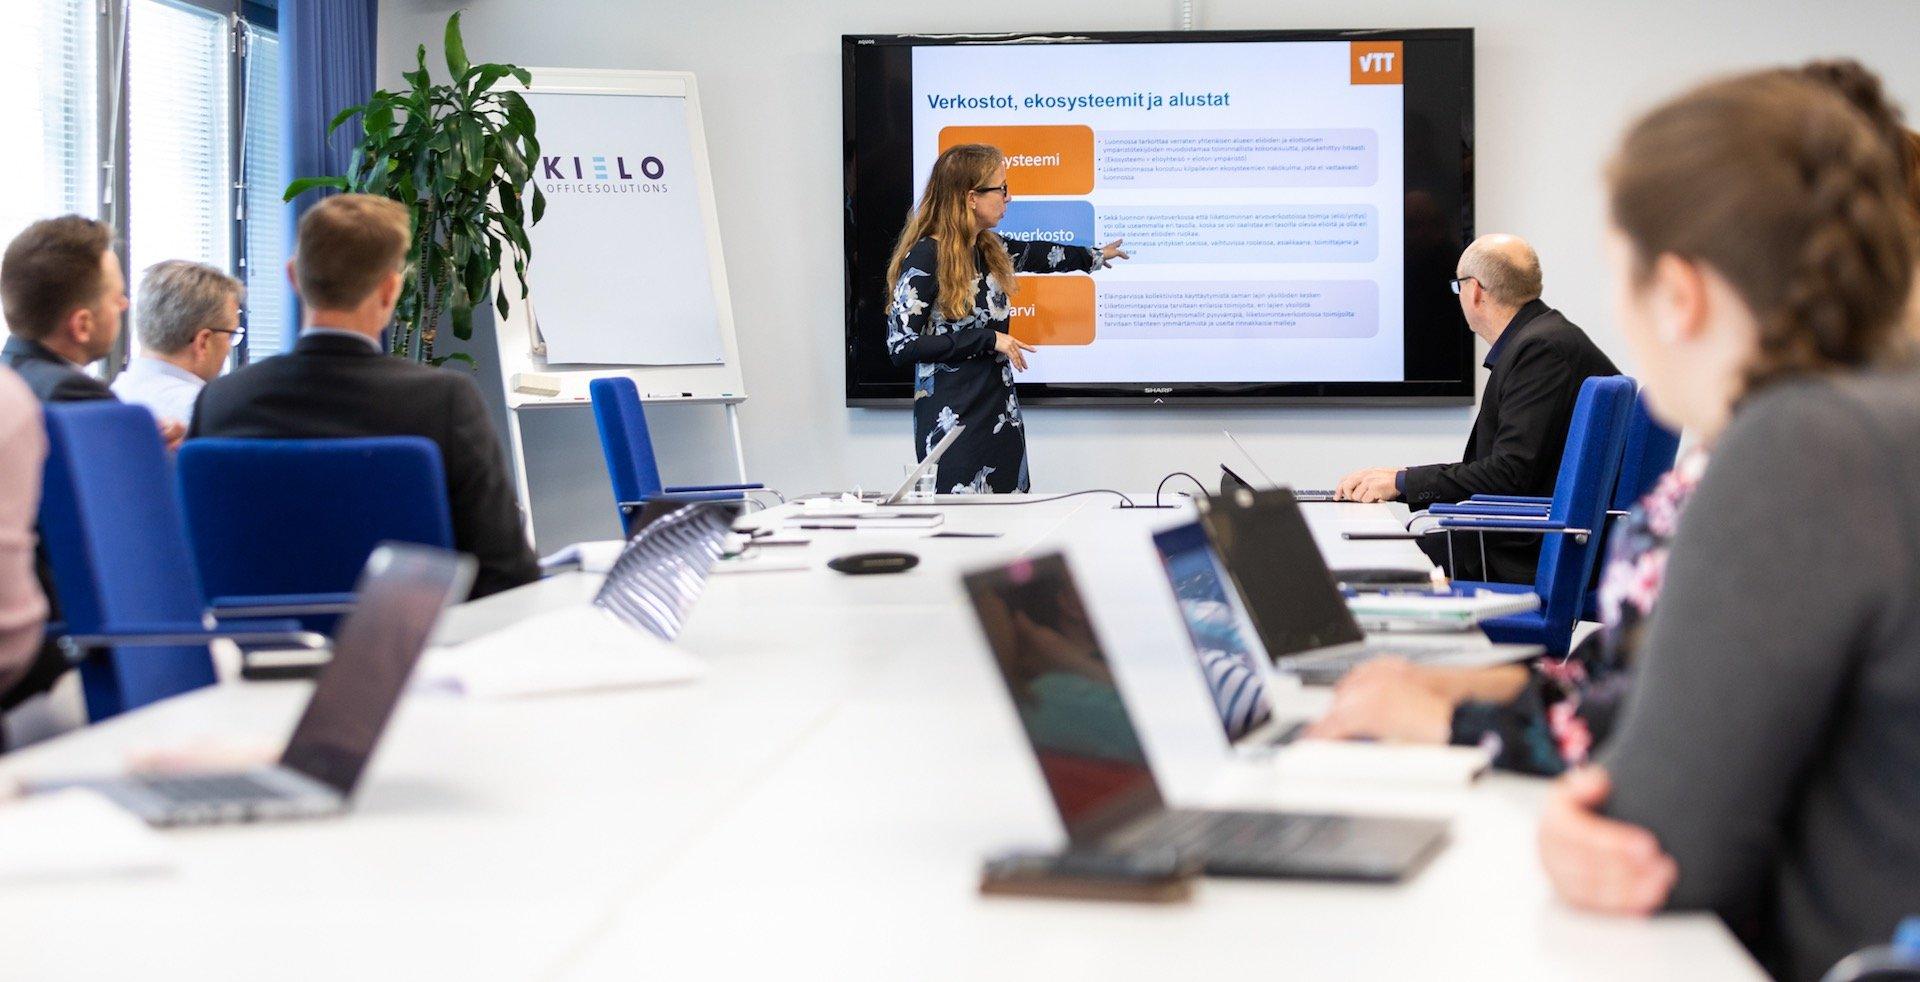 business-jkl-etelaportti-web-srgb-4946